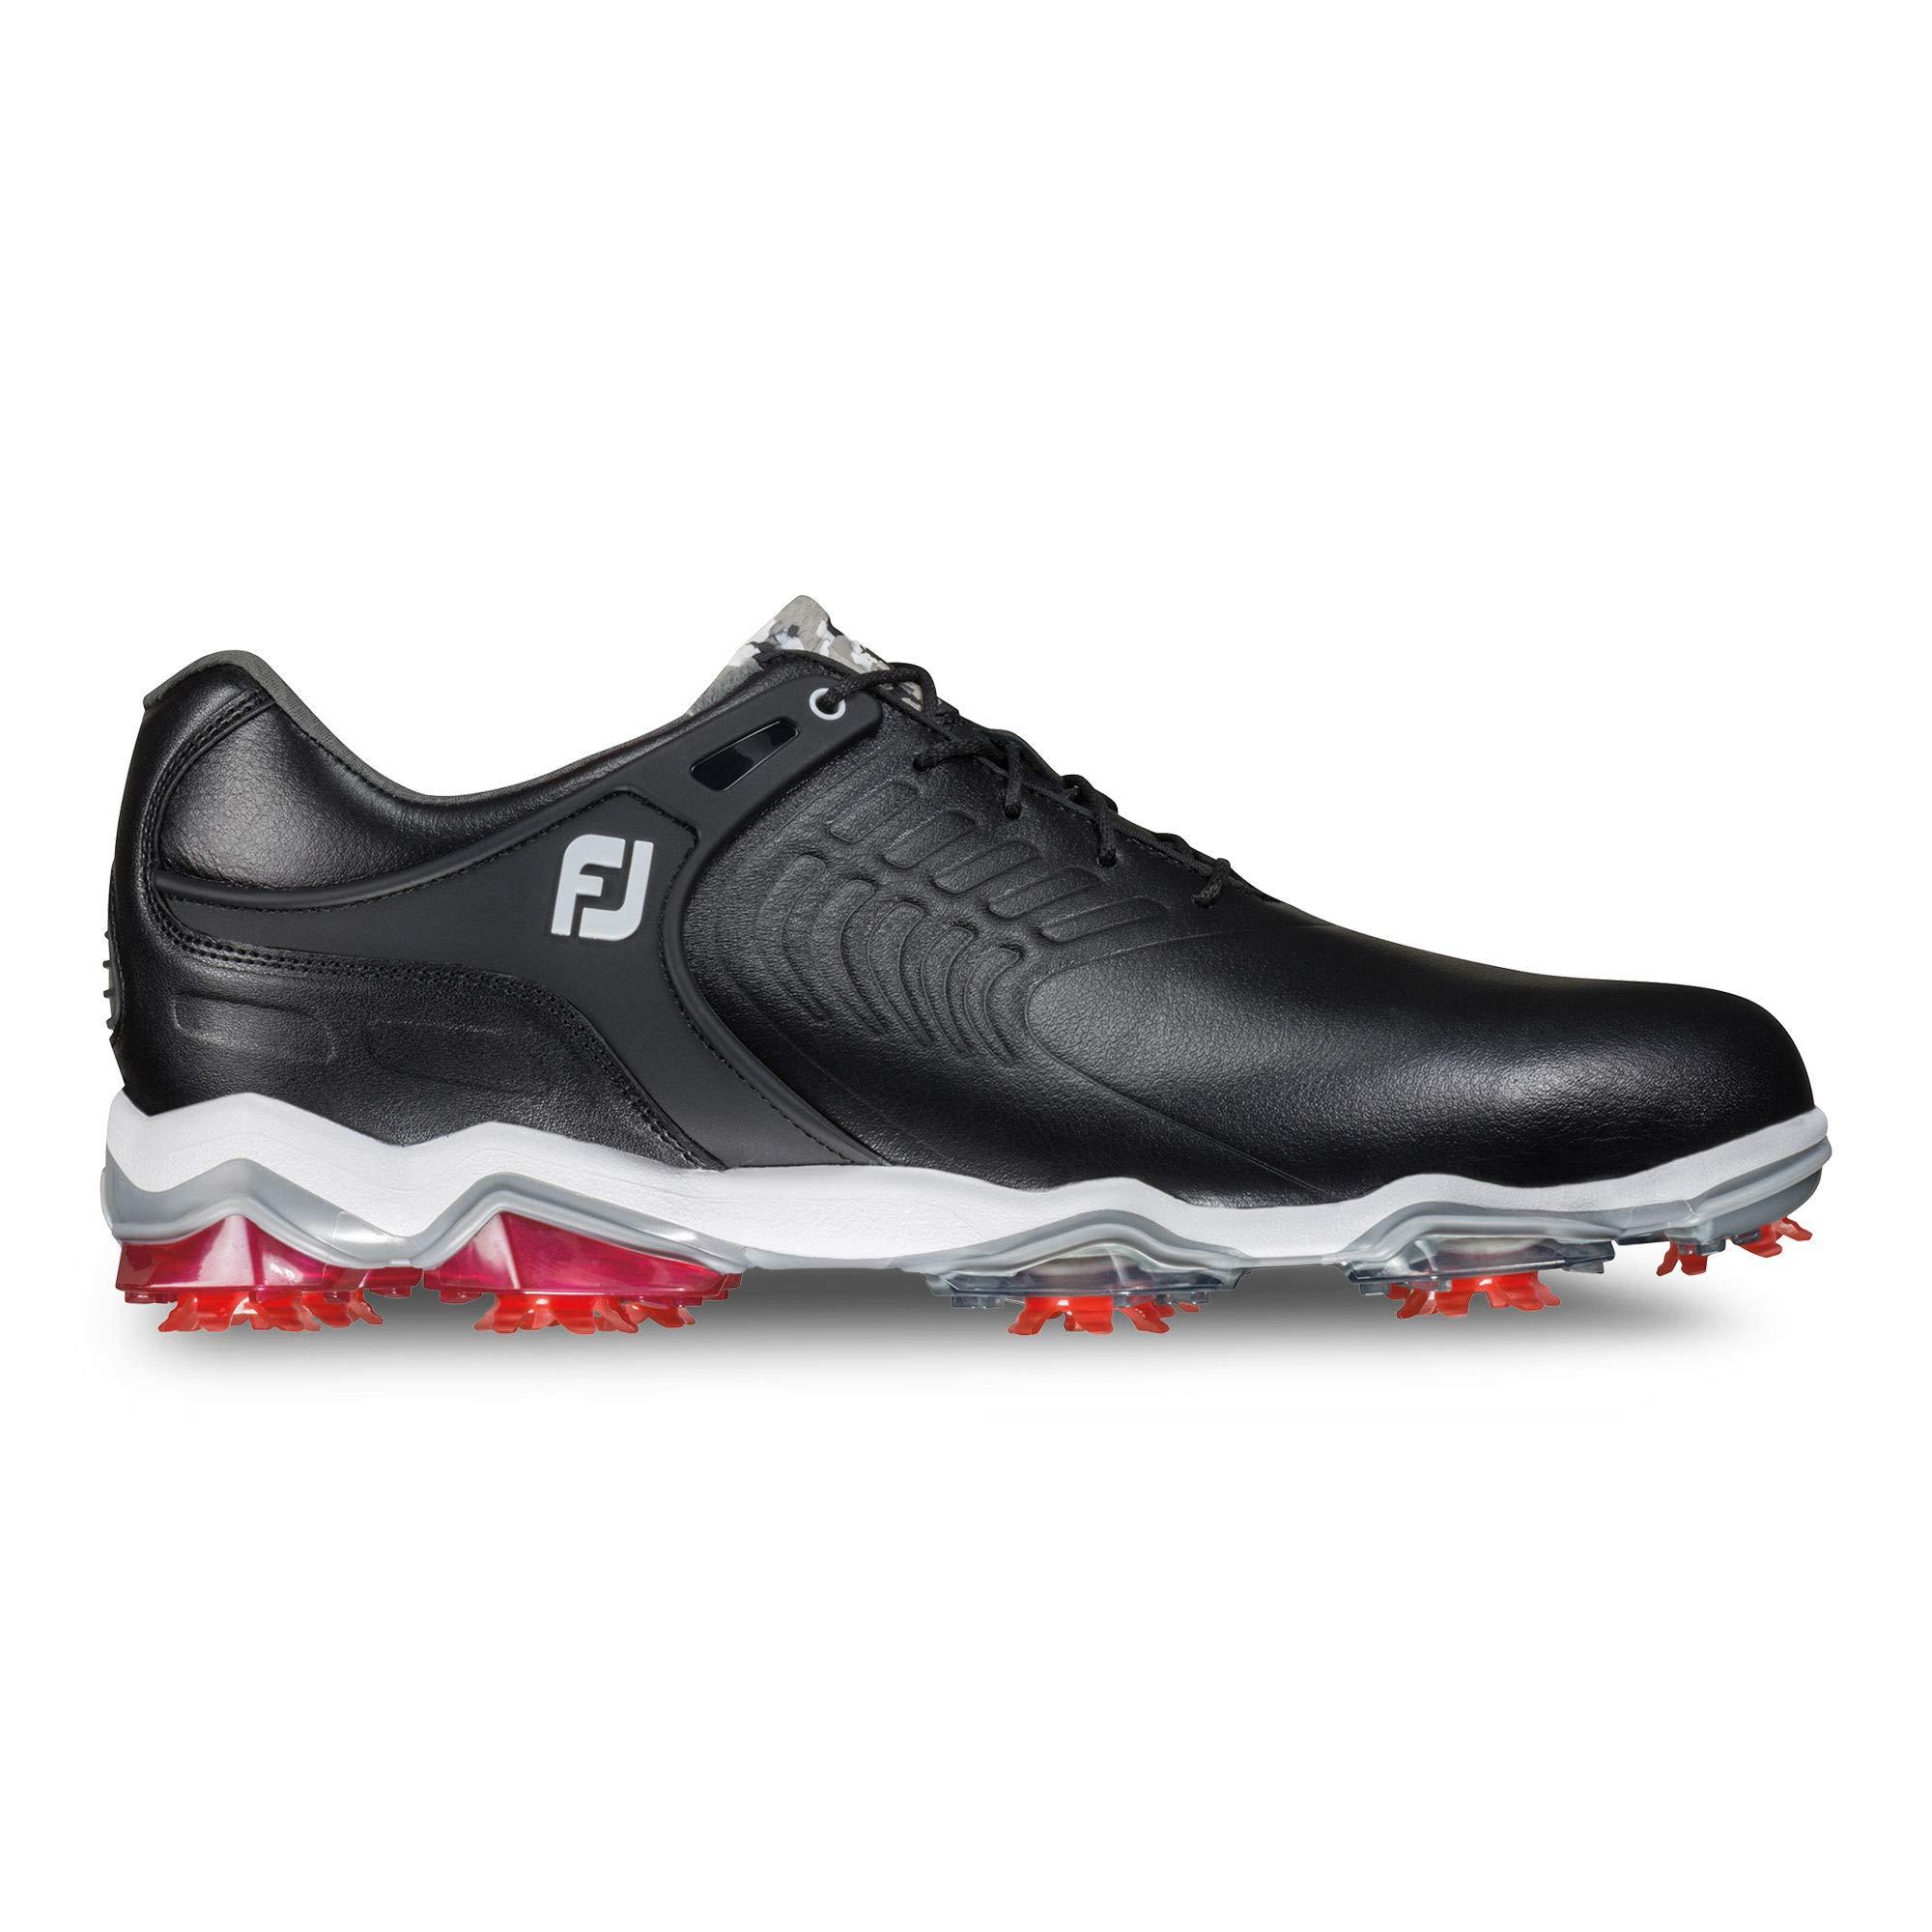 FootJoy Men's Tour-S Golf Shoes Black 9.5 W US by FootJoy